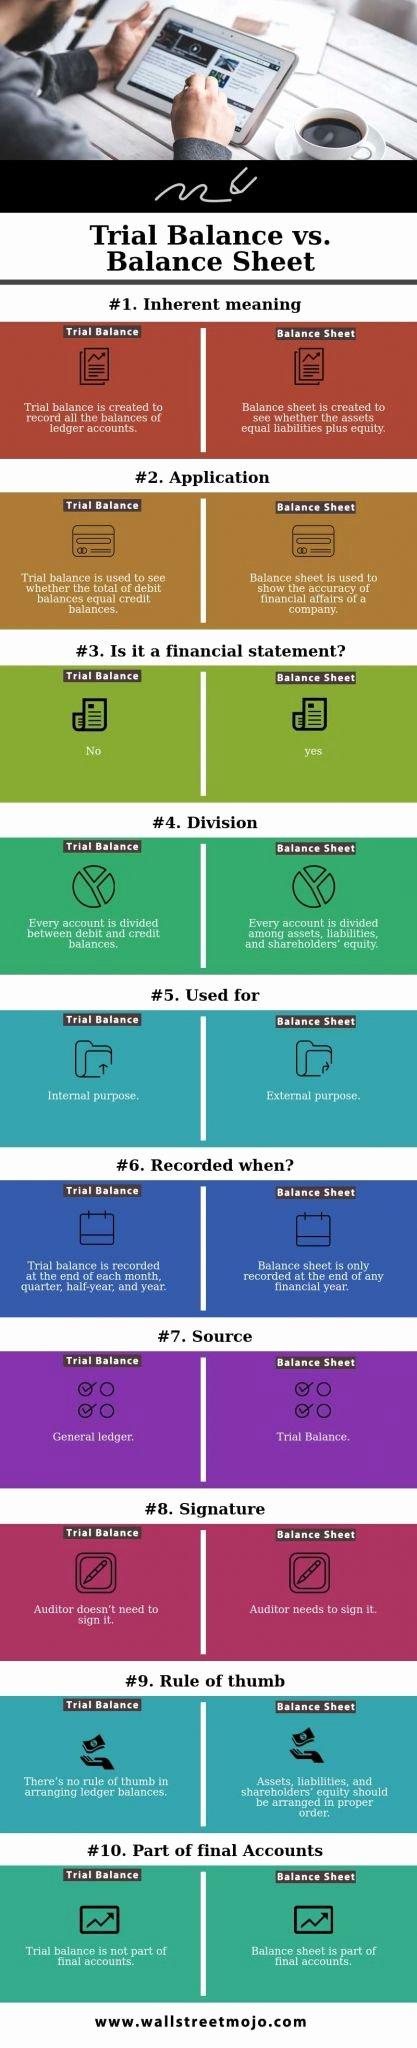 Non Profit Balance Sheet Template Fresh Non Profit Financial Statement Template Excel